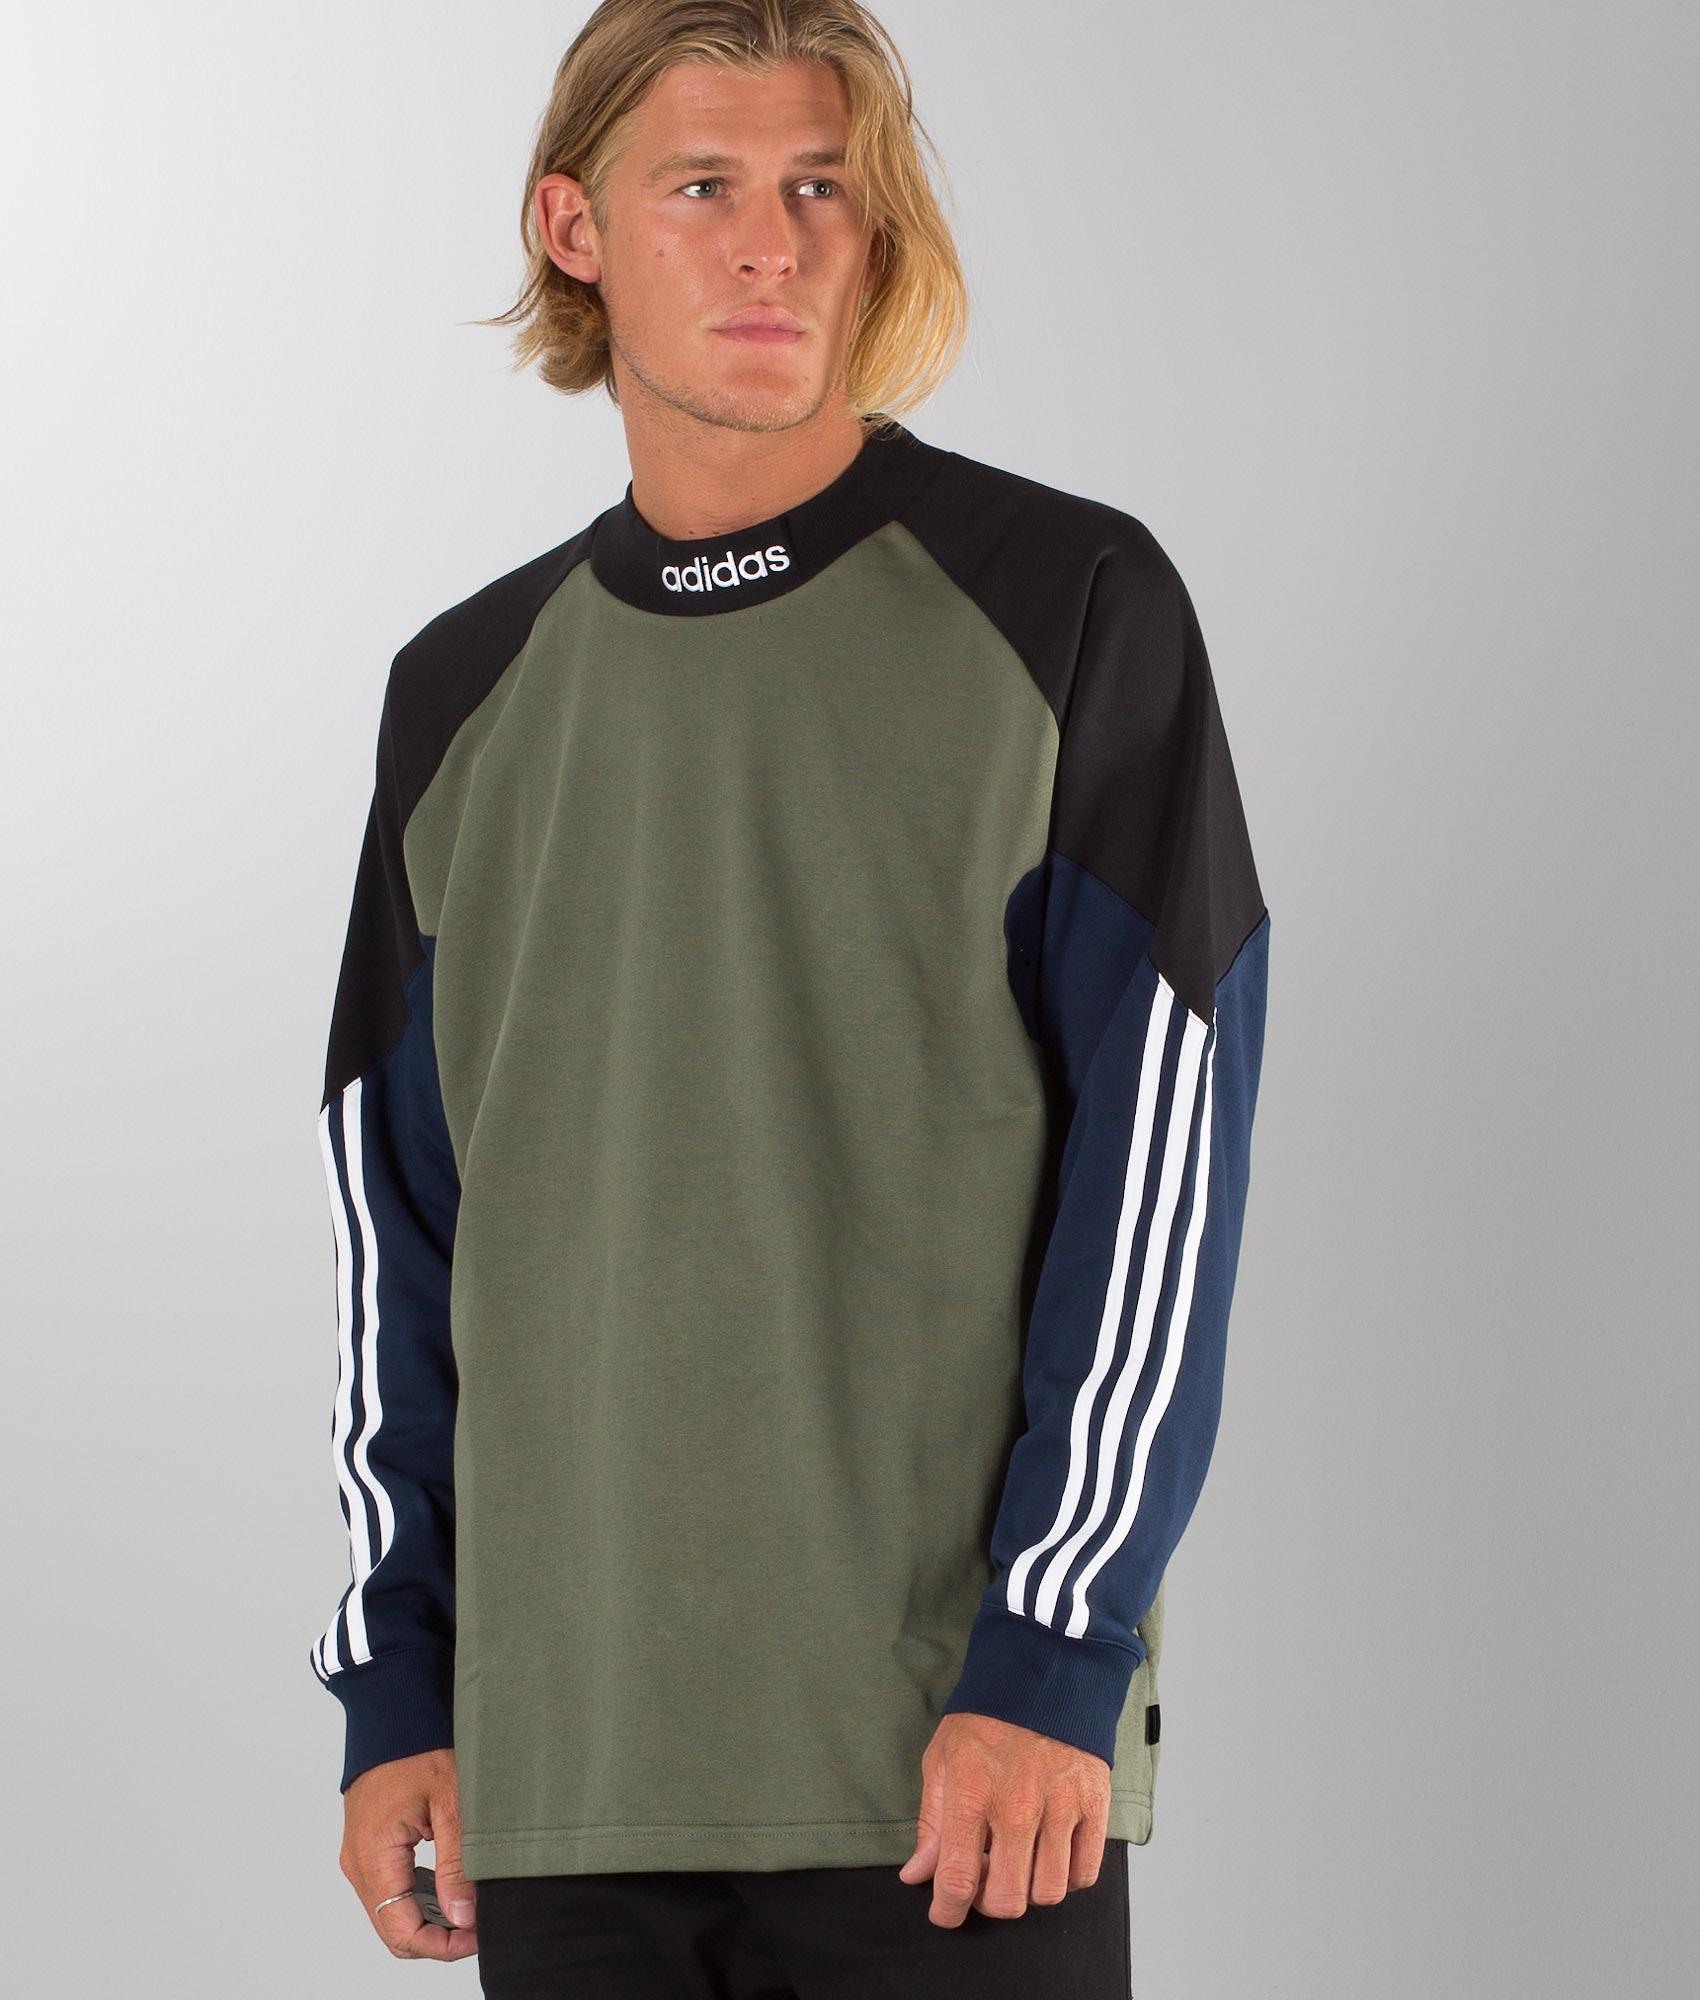 0bcc44691 Adidas Skateboarding Goalie Sweater Army Green. Base Green/Black/Collgegiate  Navy